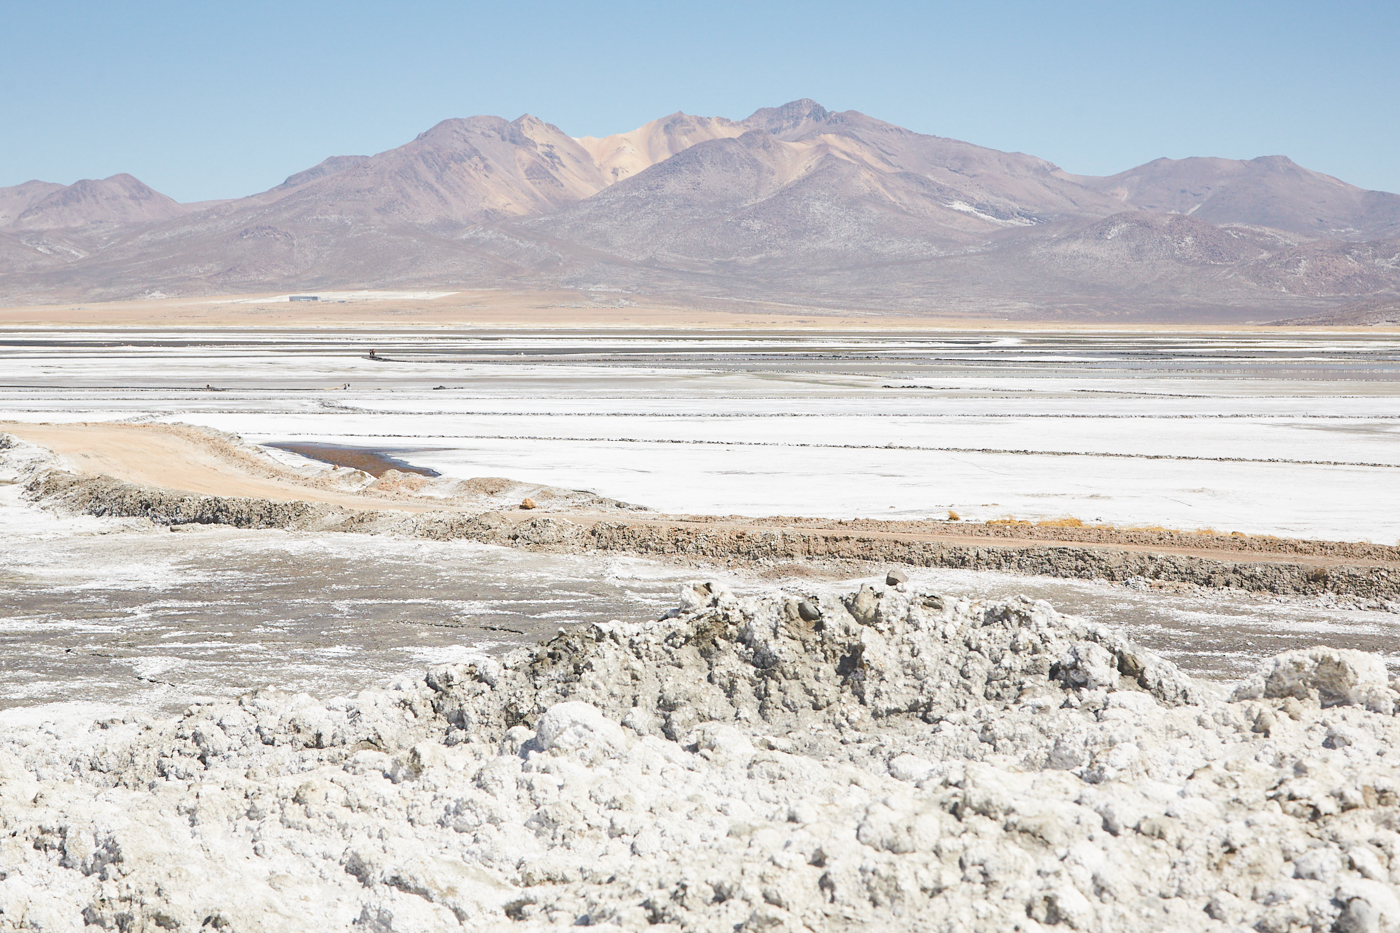 Die weiße Saline vor rosa Bergen im Reserva Nacional de Salinas y Aguada Blanca